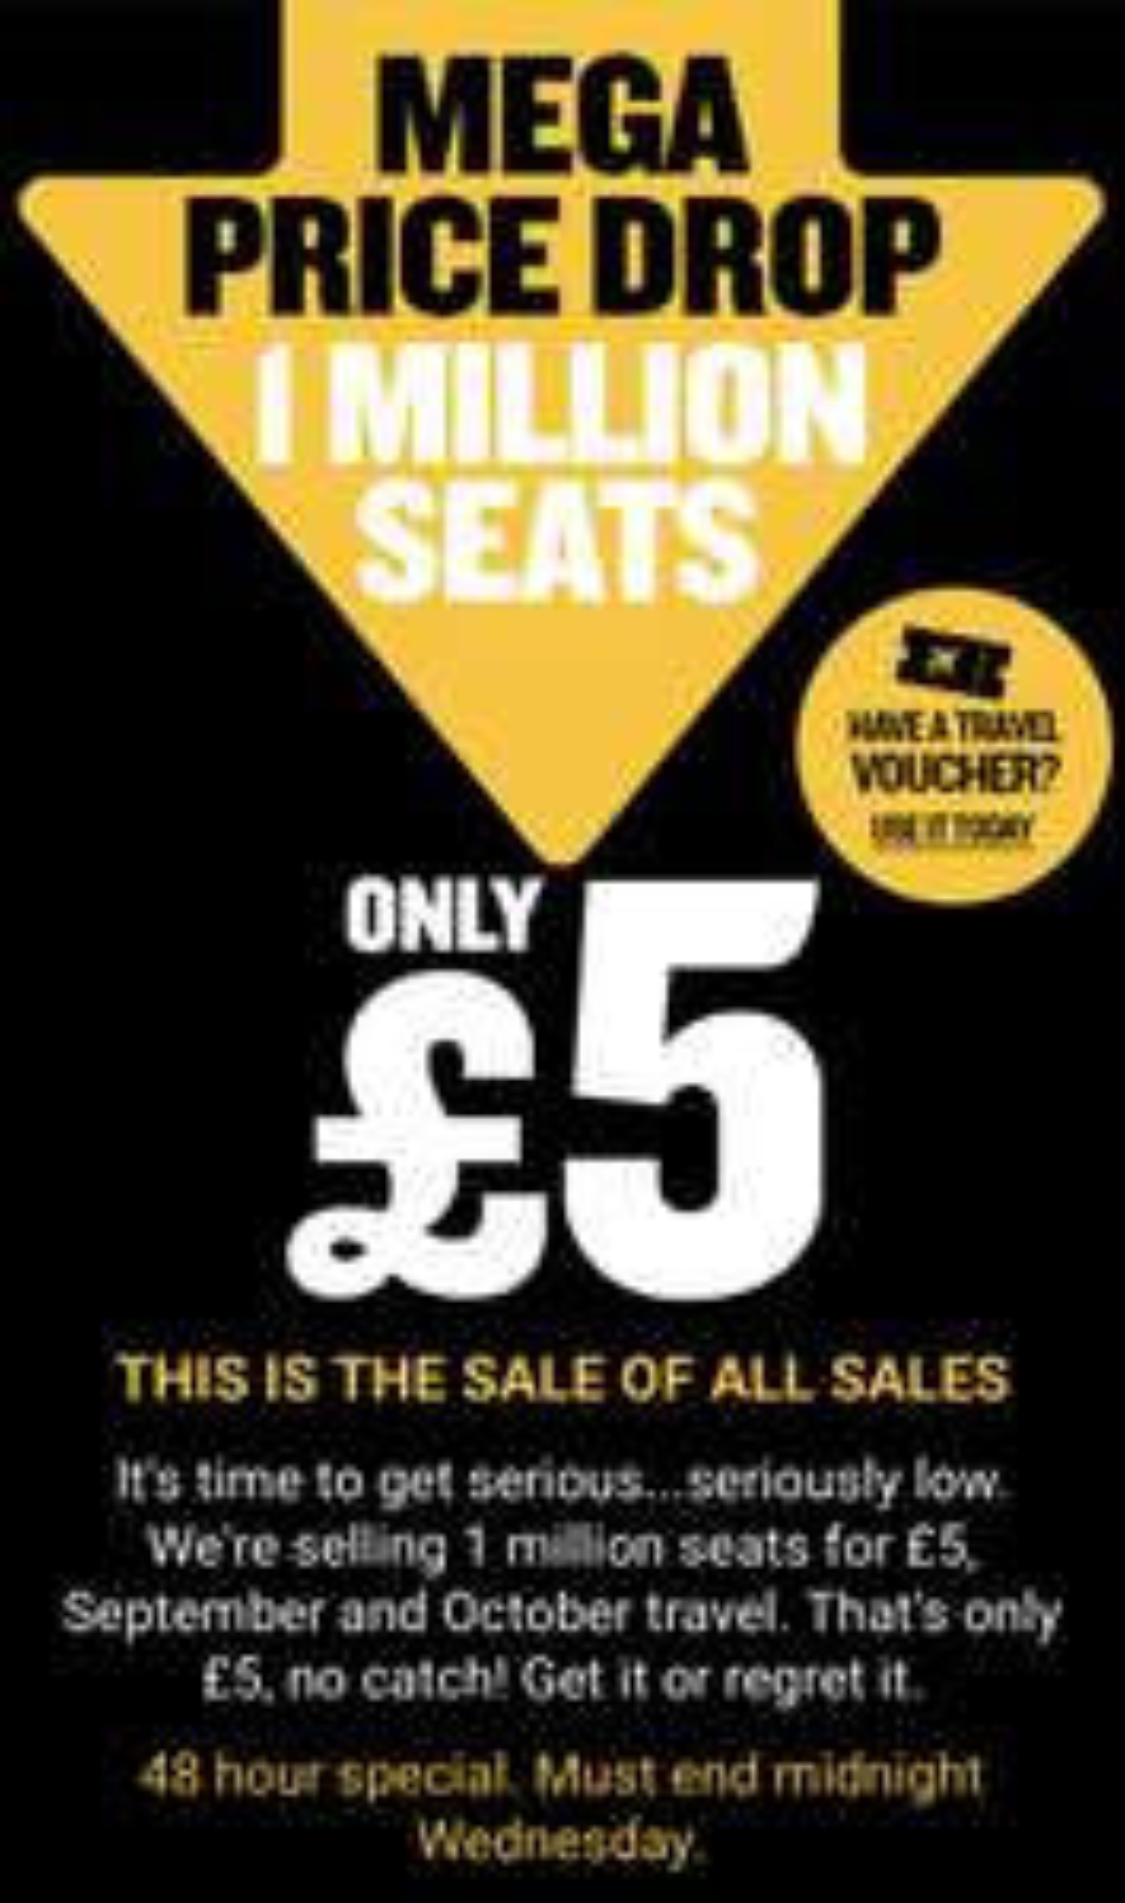 RYANAIR mega sale 1 million seats for £5